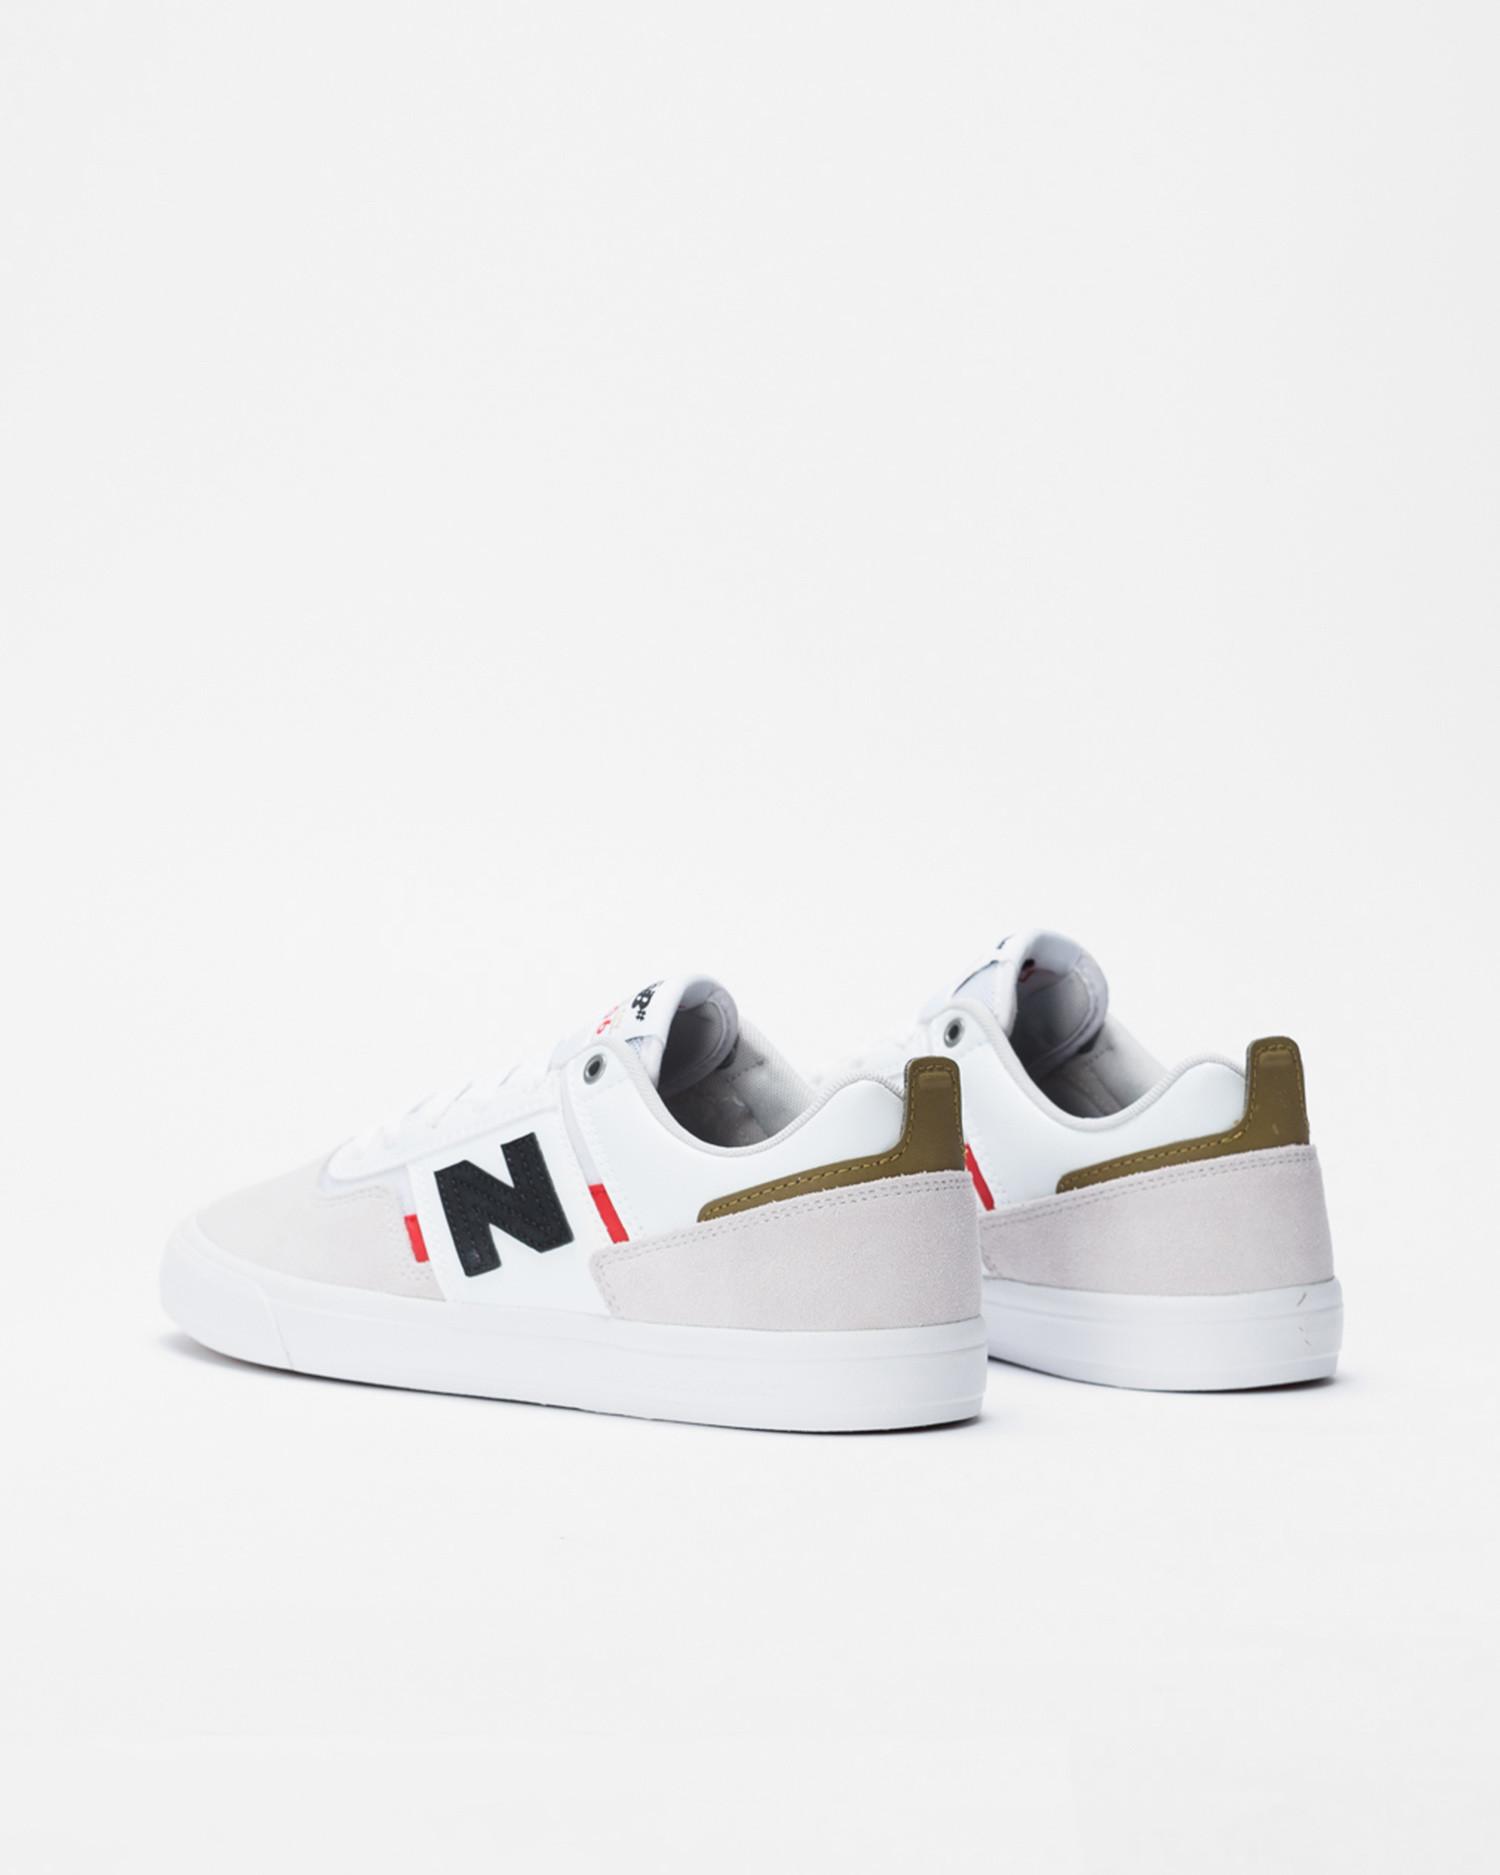 New Balance Numeric NM306 Mar Summer Fog